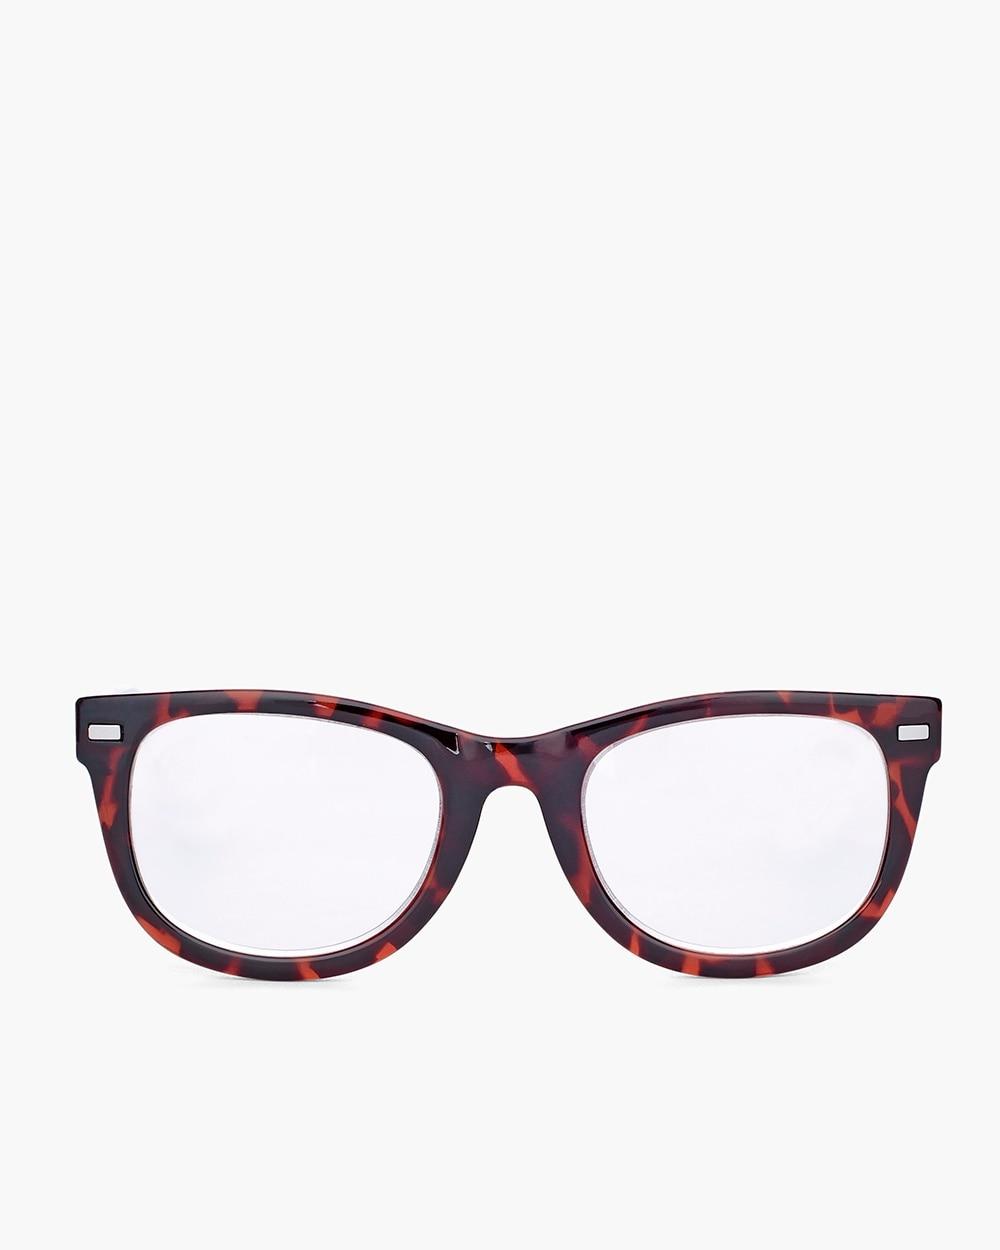 5950ed63477f Red Faux-Tortoiseshell Reading Glasses - Chico s